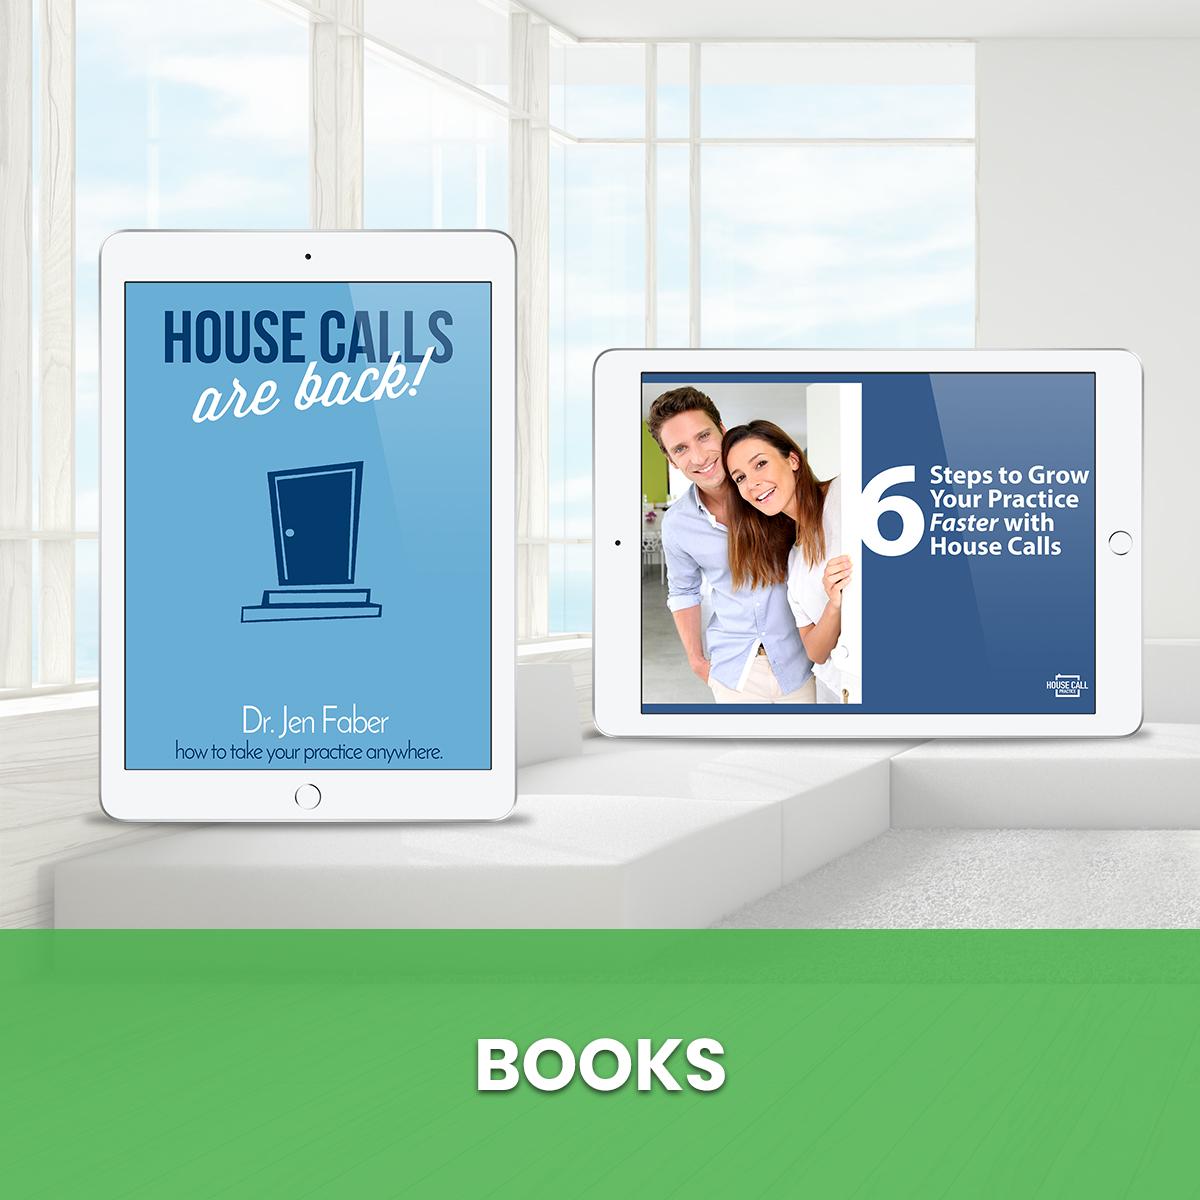 Books - Green